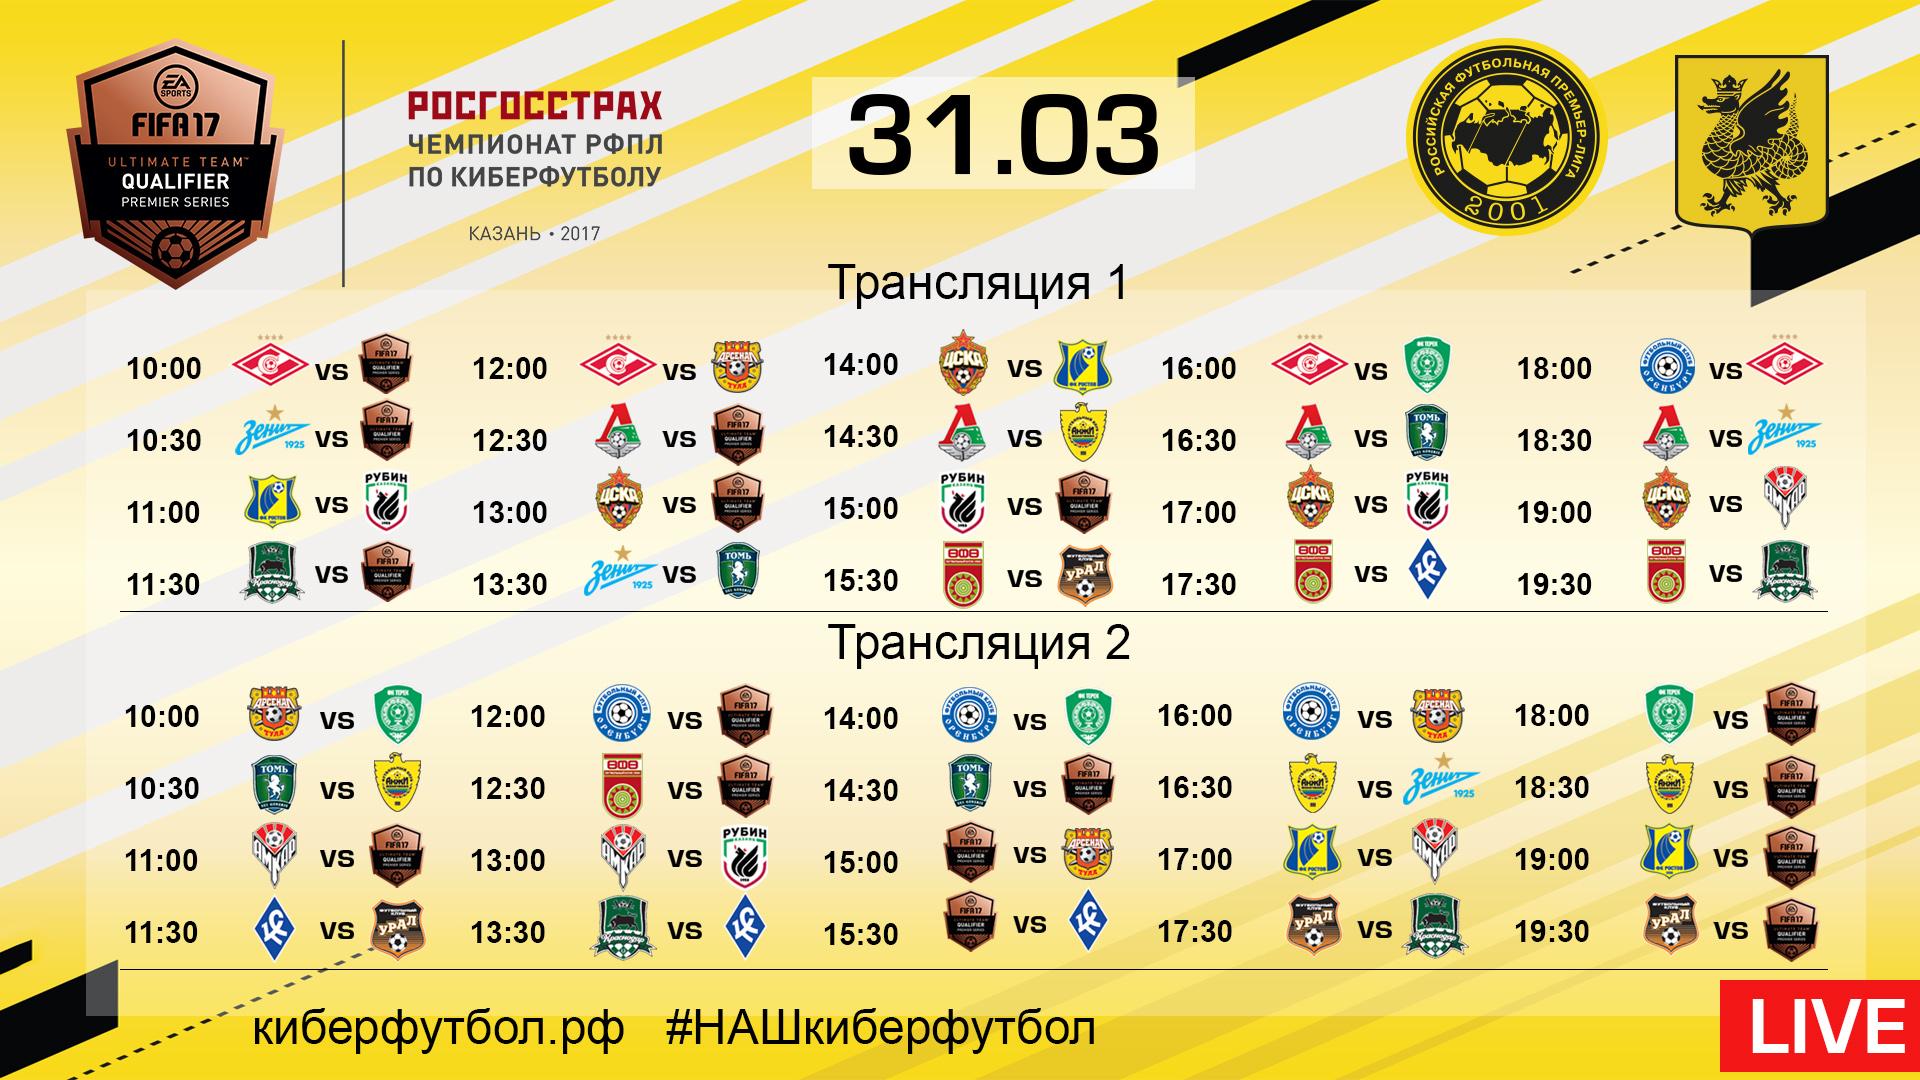 Онлайн трансляция группового этапа «РОСГОССТРАХ Чемпионата РФПЛ по киберфутболу»